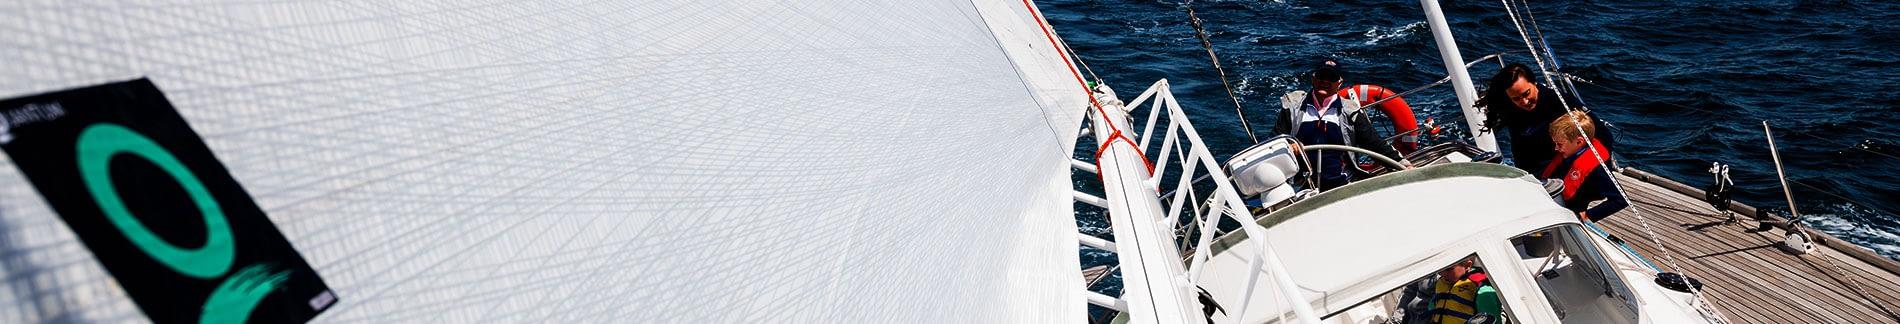 toerzeil Quantum Sails